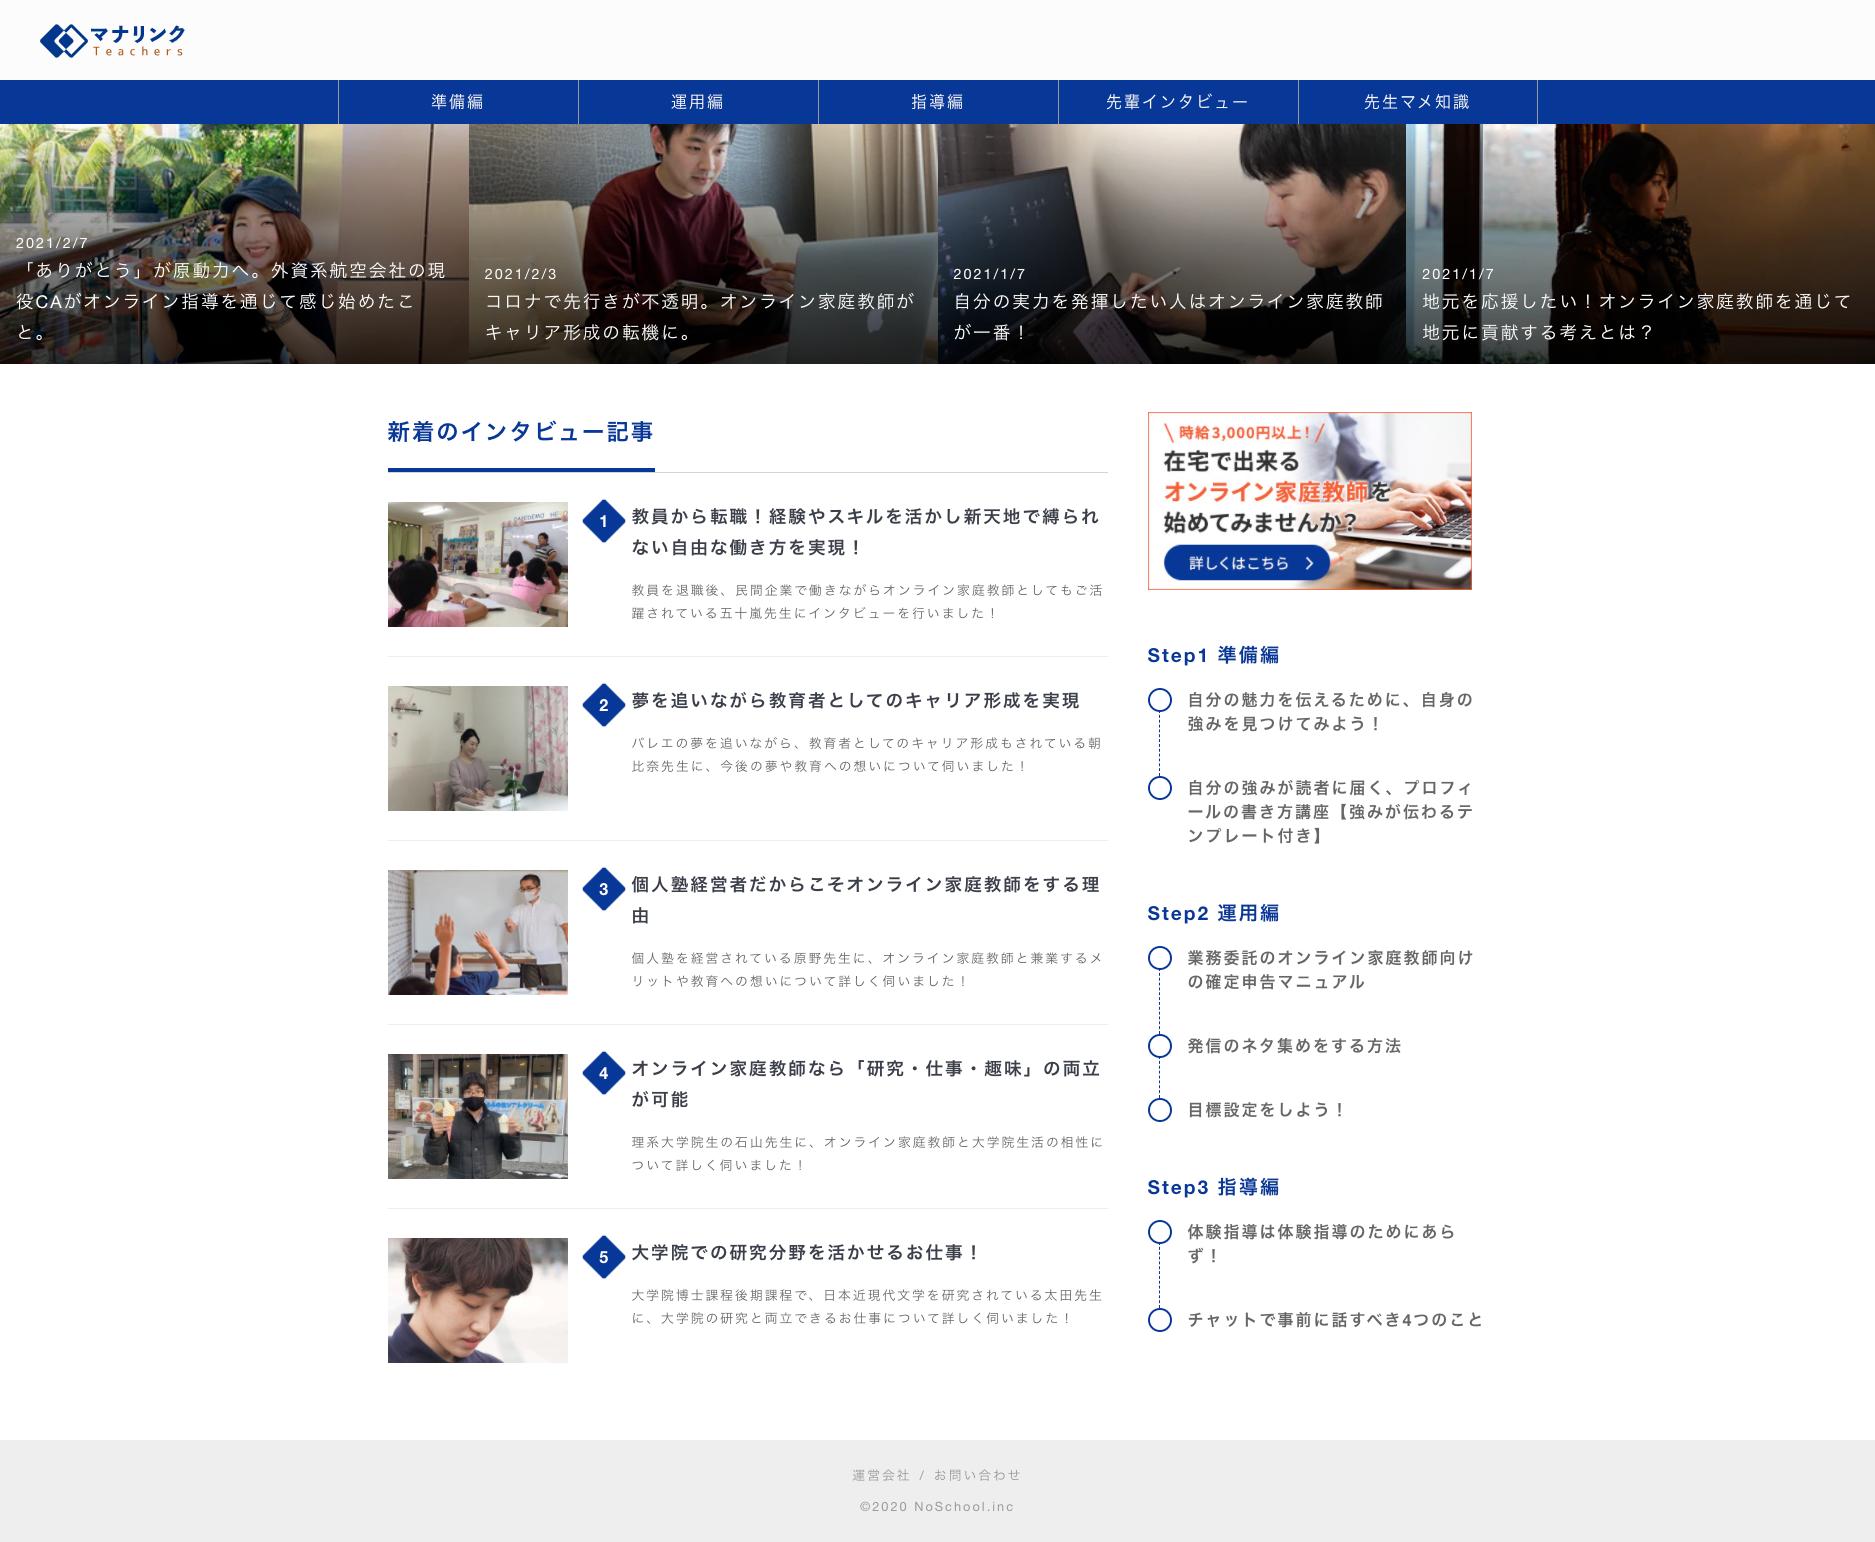 FireShot Capture 001 - マナリンクTeachers - オンライン家庭教師の働き方・採用を応援! - for-teachers manalink jp